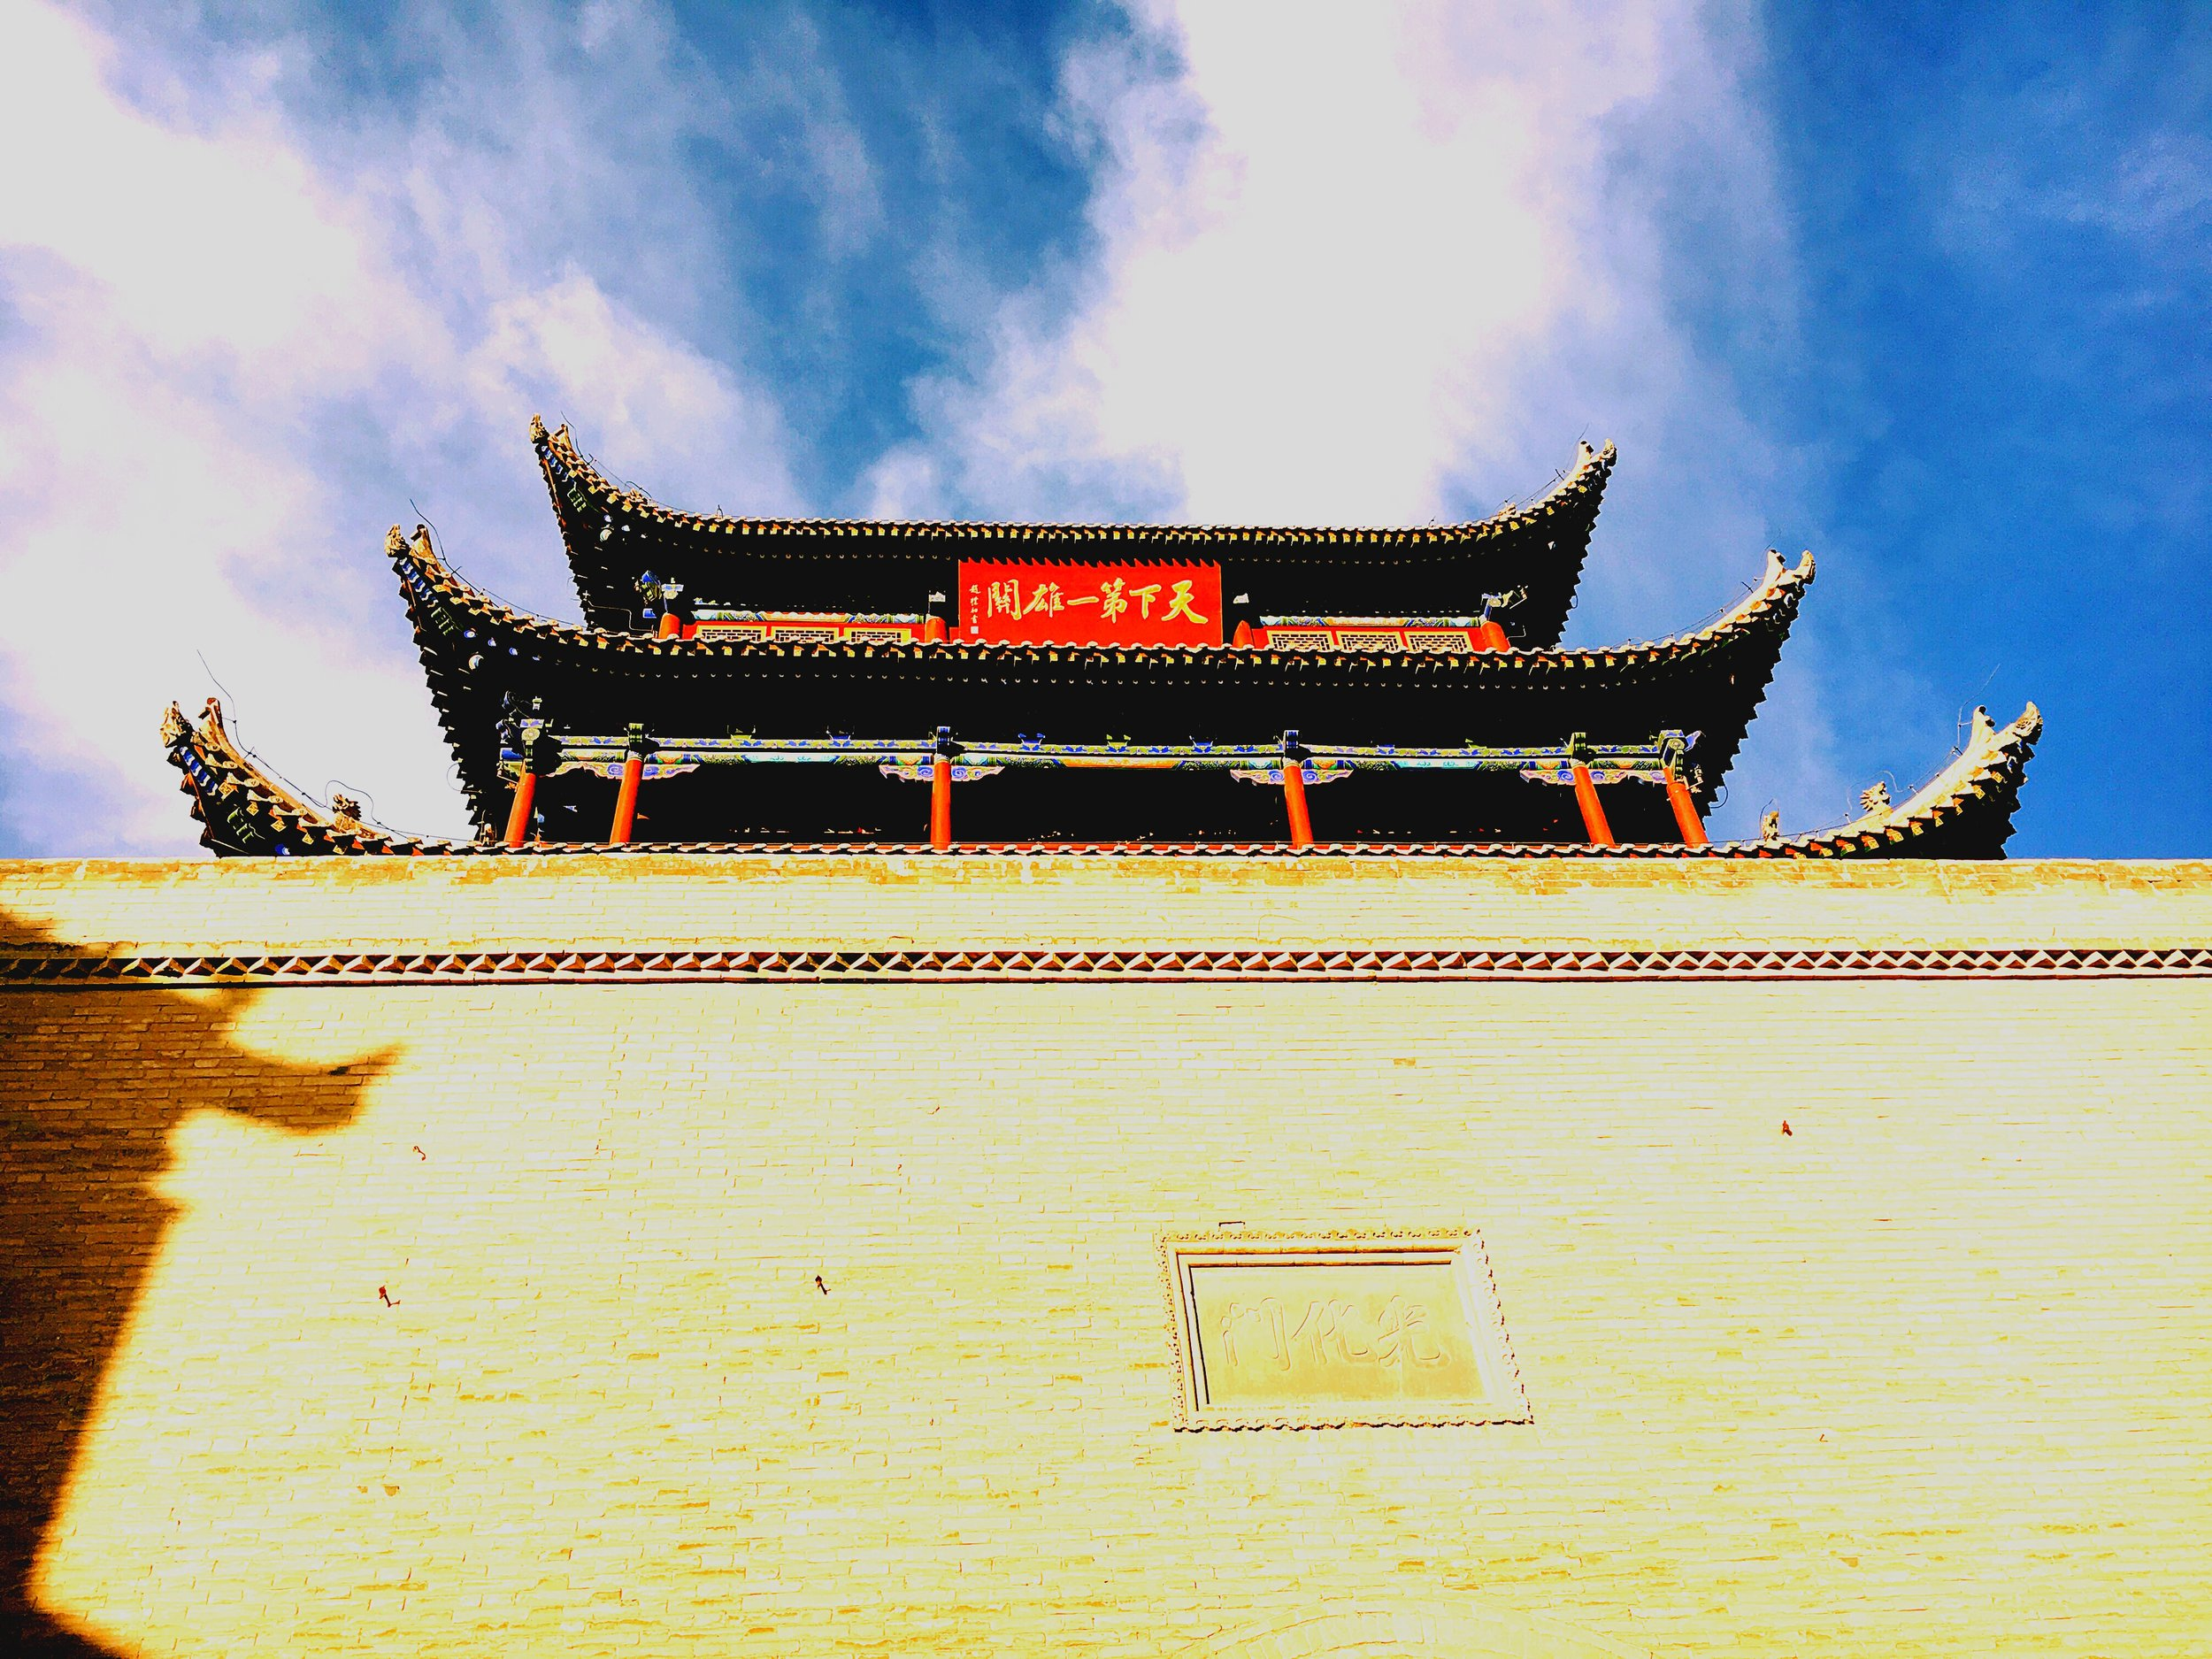 jia Ya Guan Fortress cover